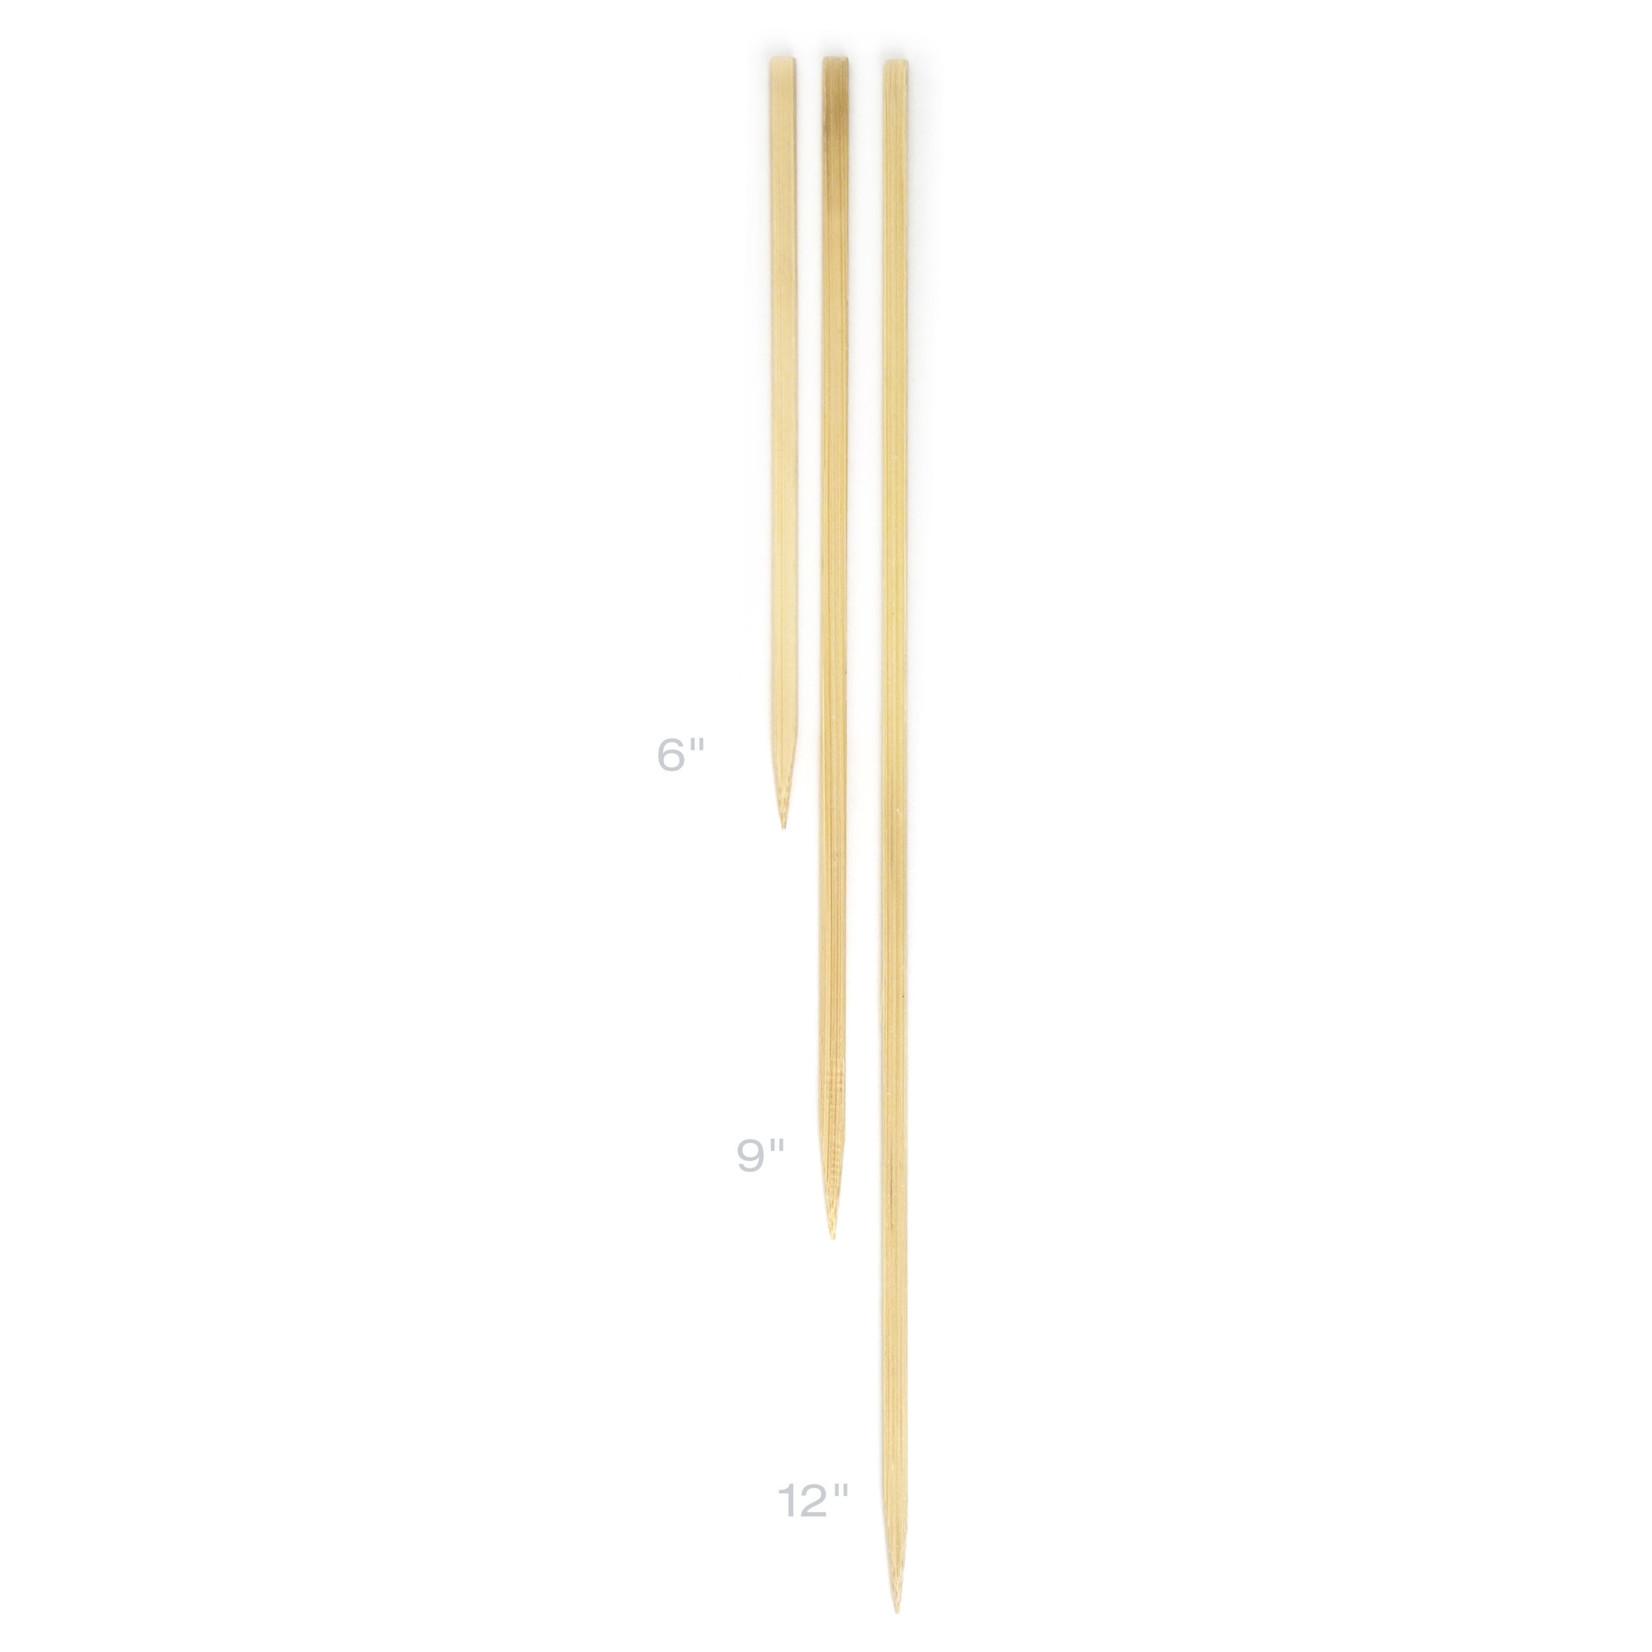 RSVP International Bamboo Skewers